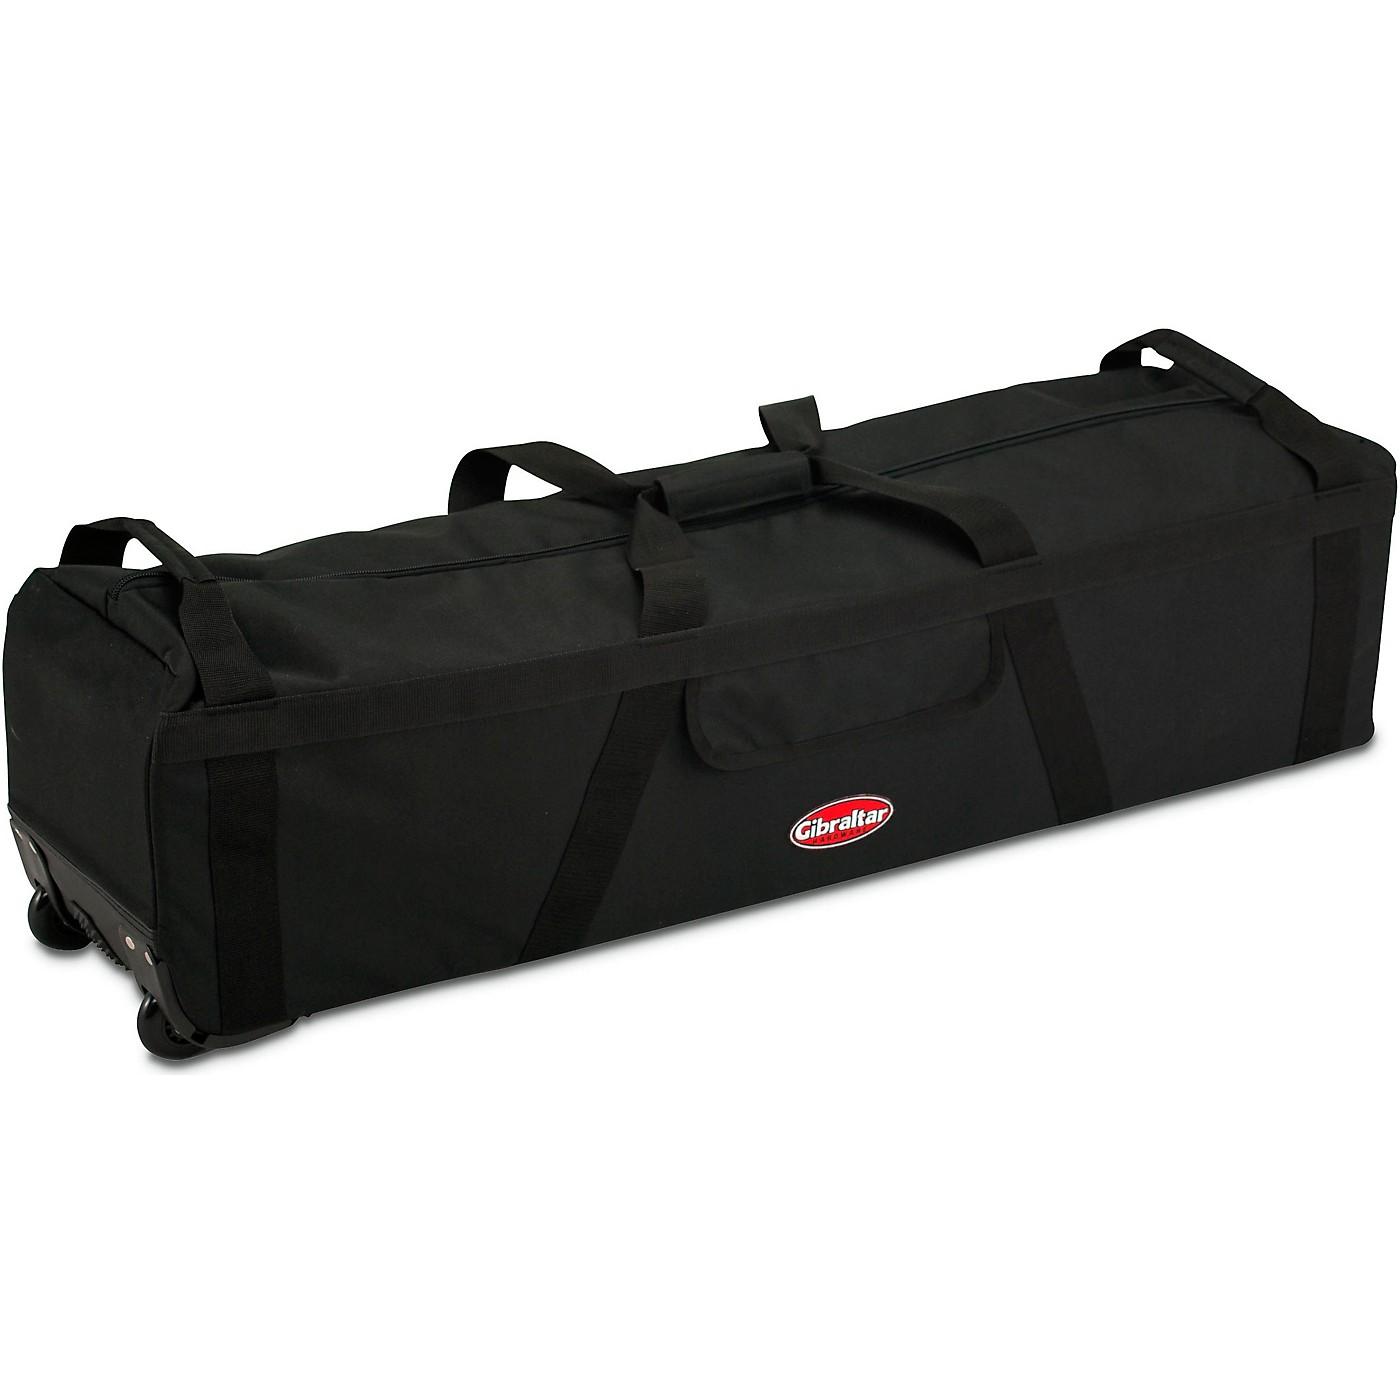 Gibraltar Long Hardware Bag With Wheels thumbnail